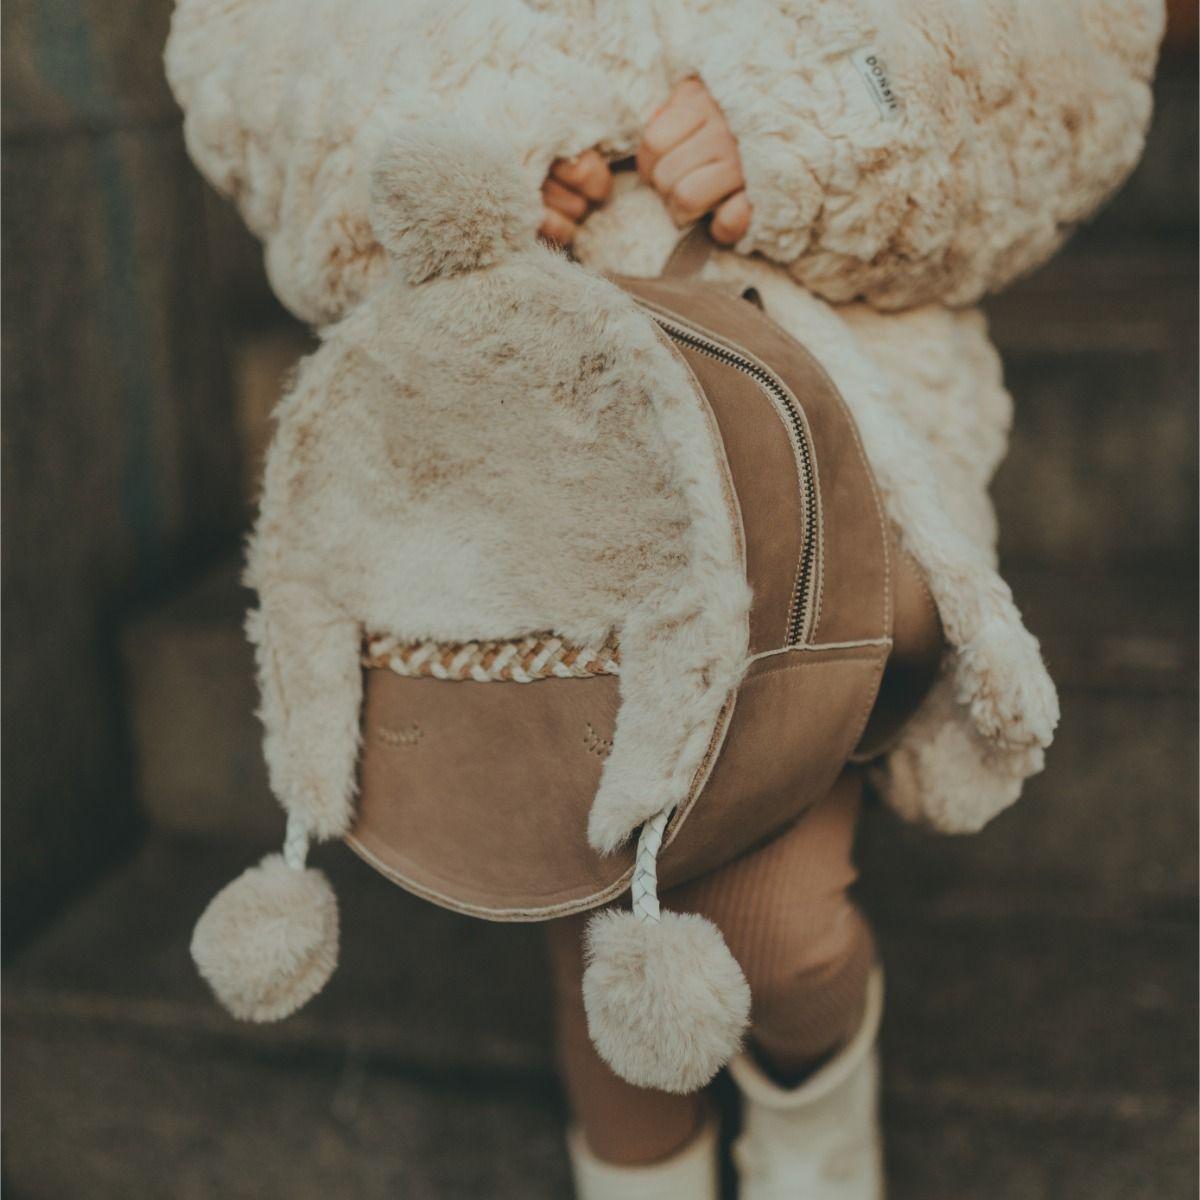 Eky Schoolbag | Truffle Nubuck